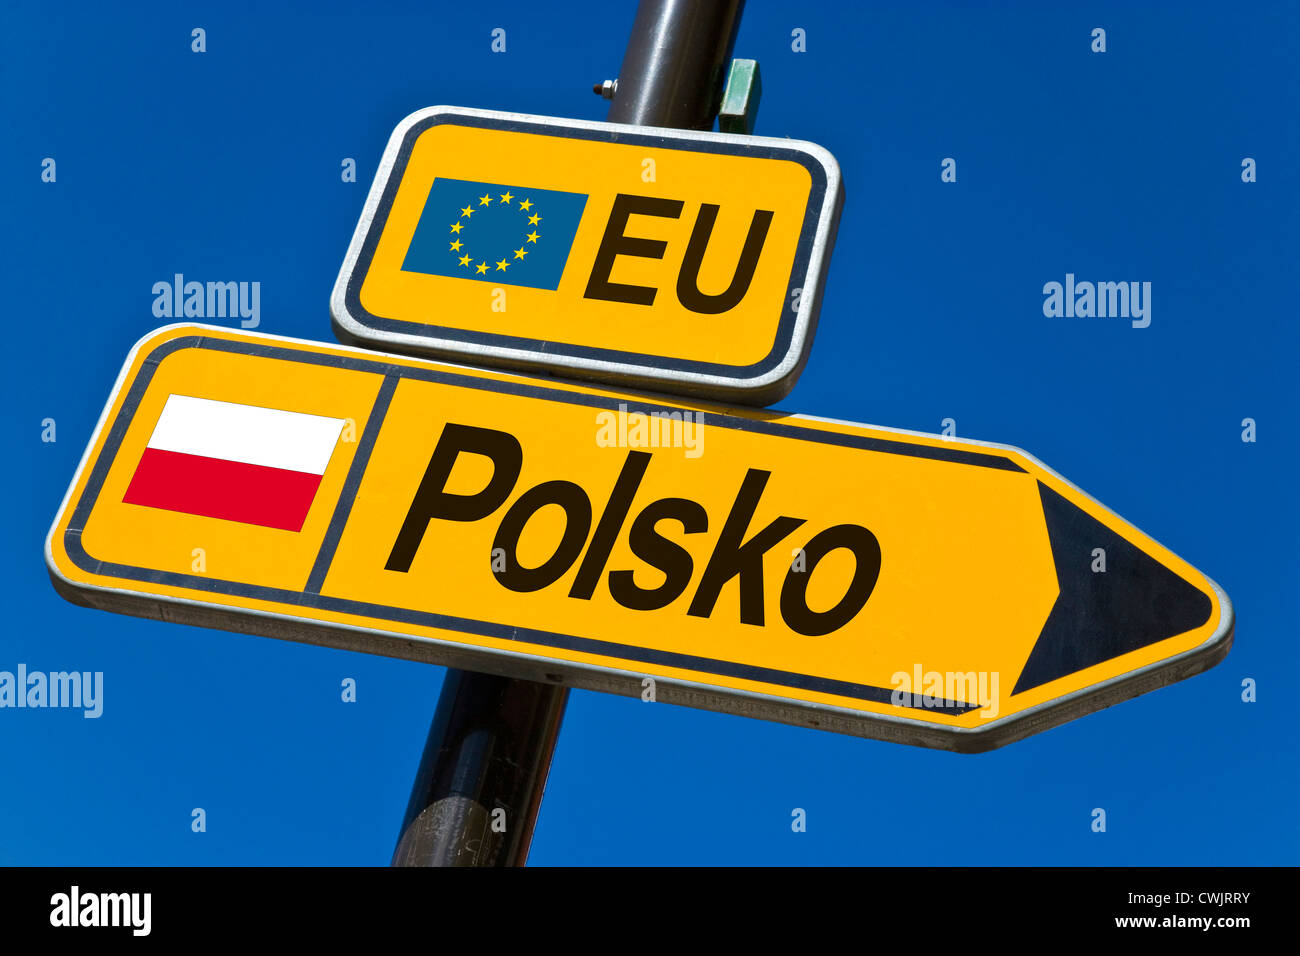 European Union and flag of  Poland - Stock Image